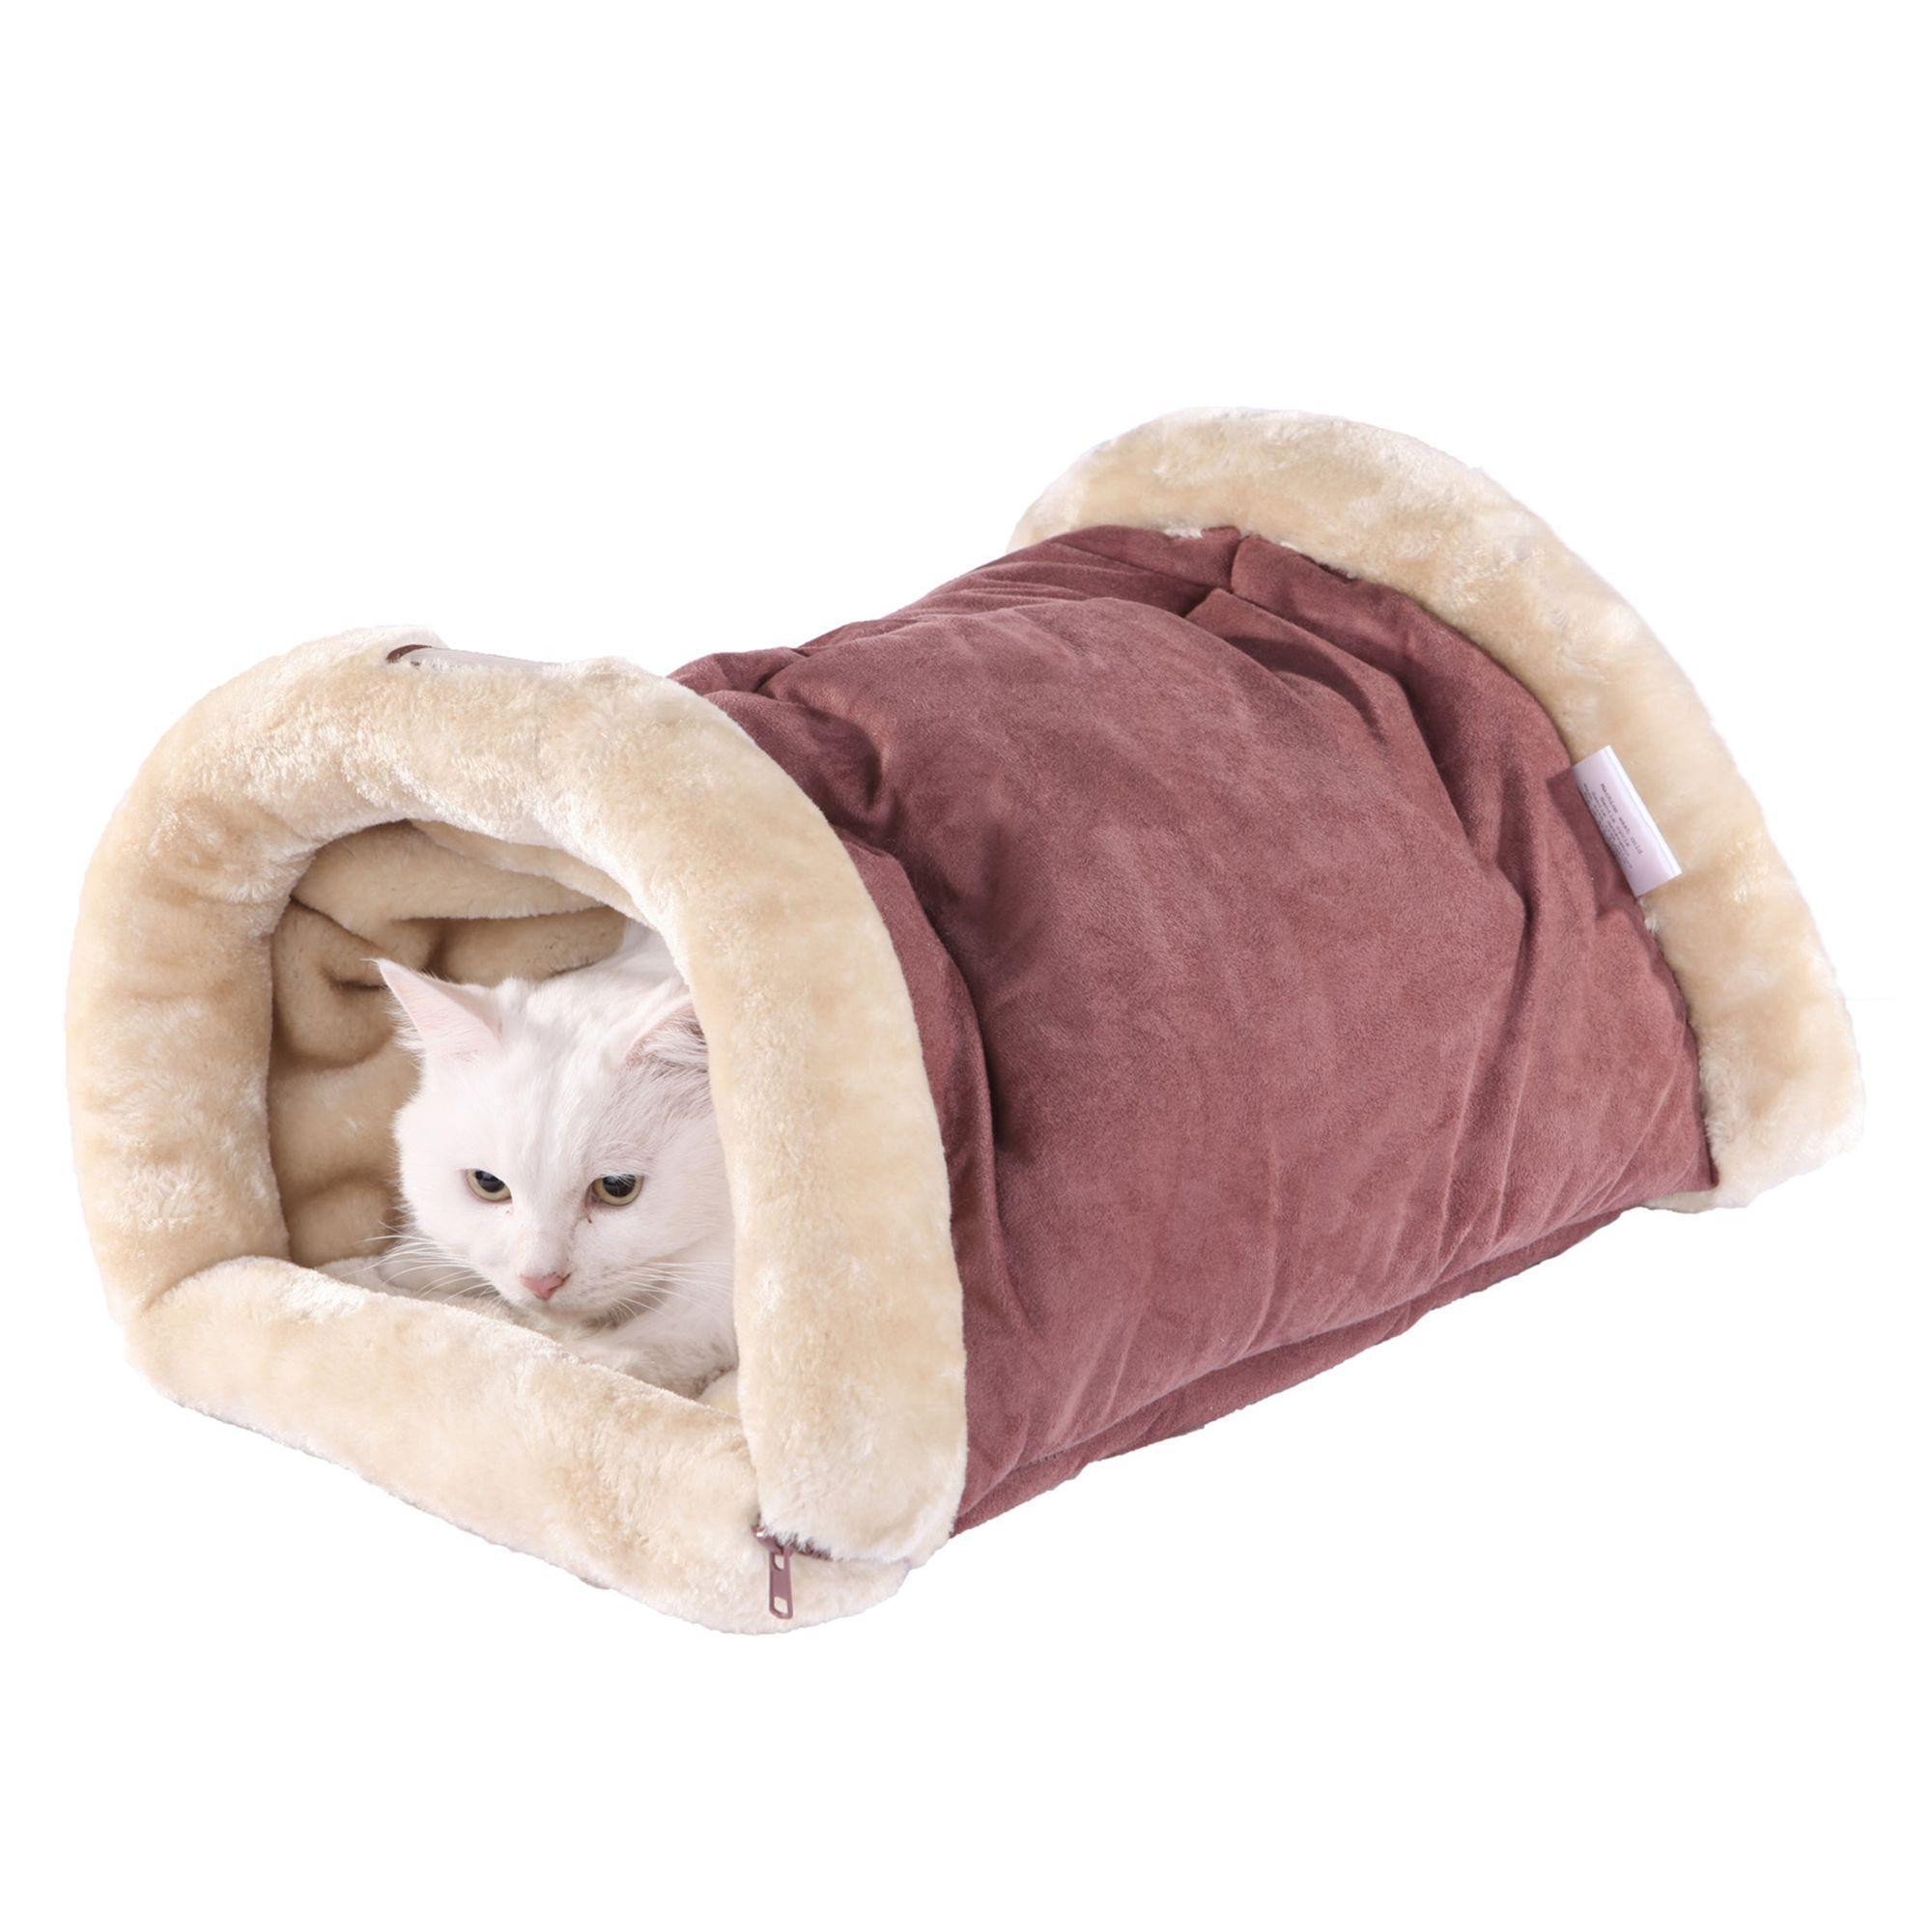 "Armarkat Multi-Use Enclosed Pet Bed size: 22""L x 14""W x 10""H"